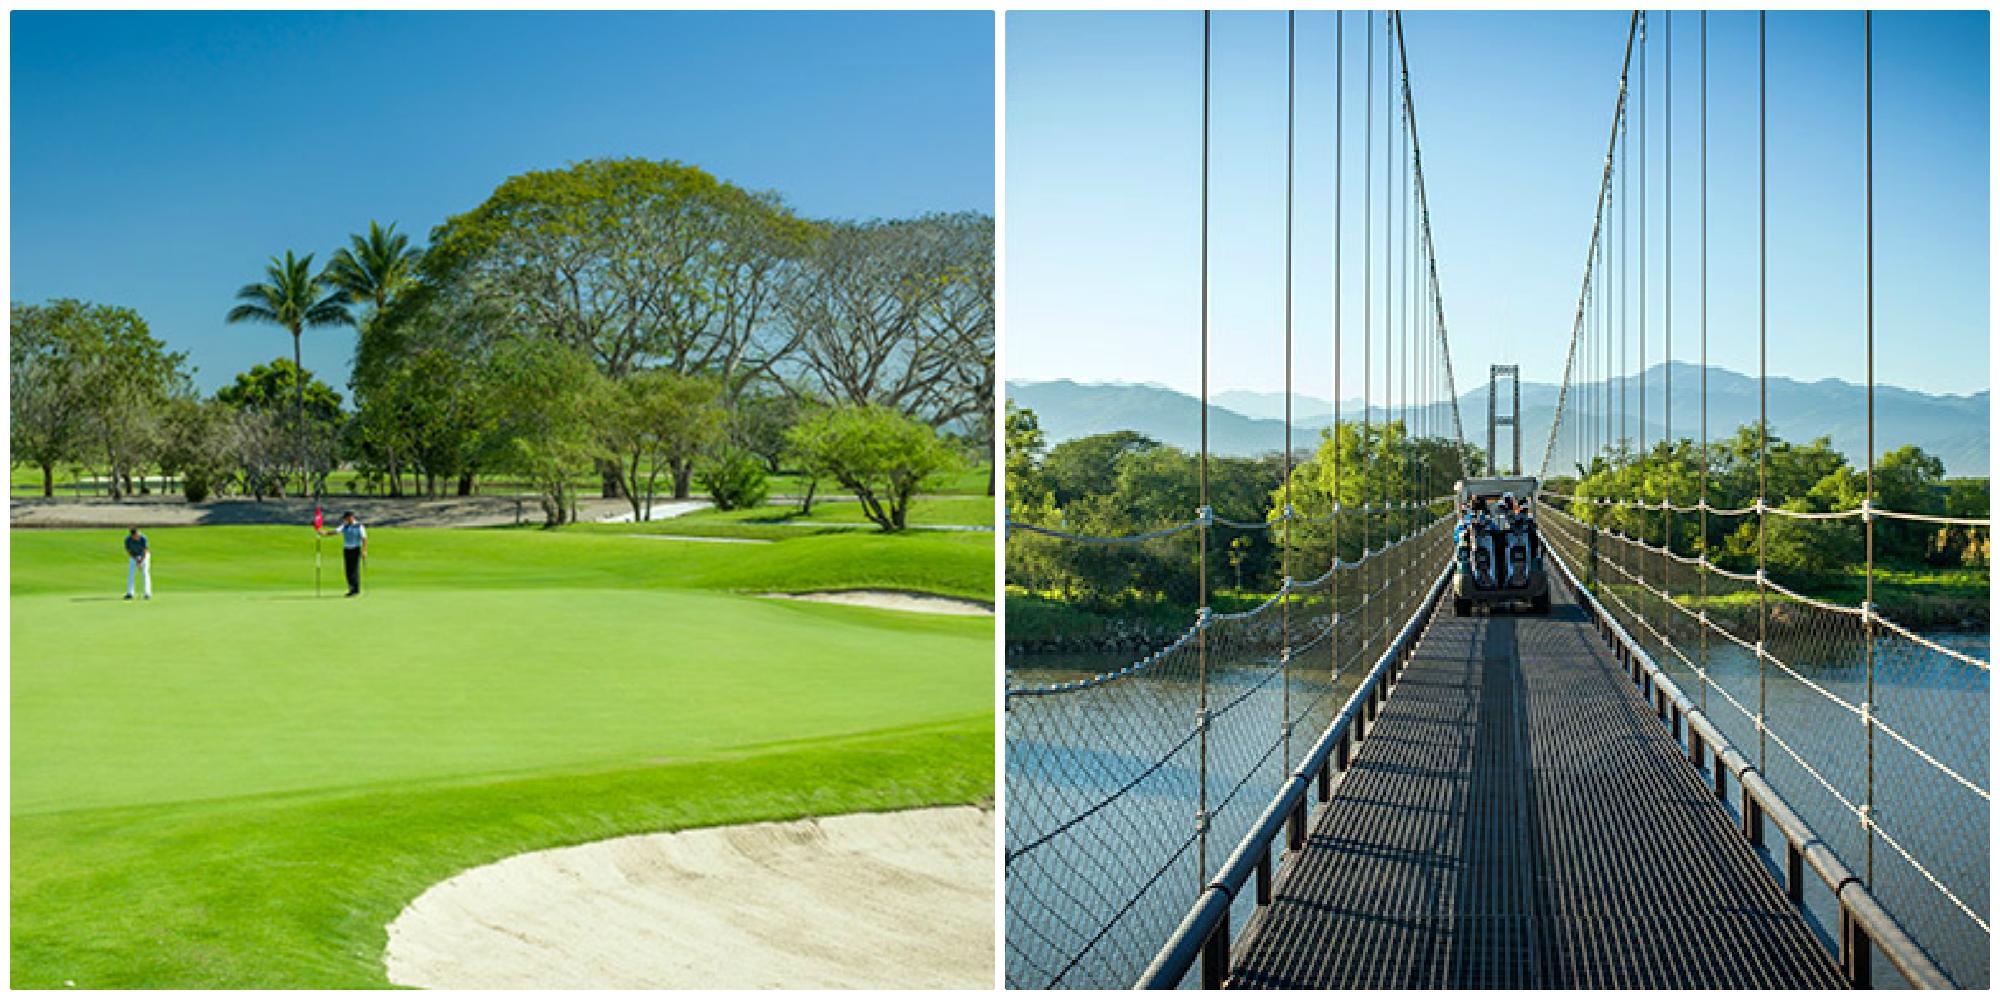 Grand Luxxe Golf Nuevo Vallarta